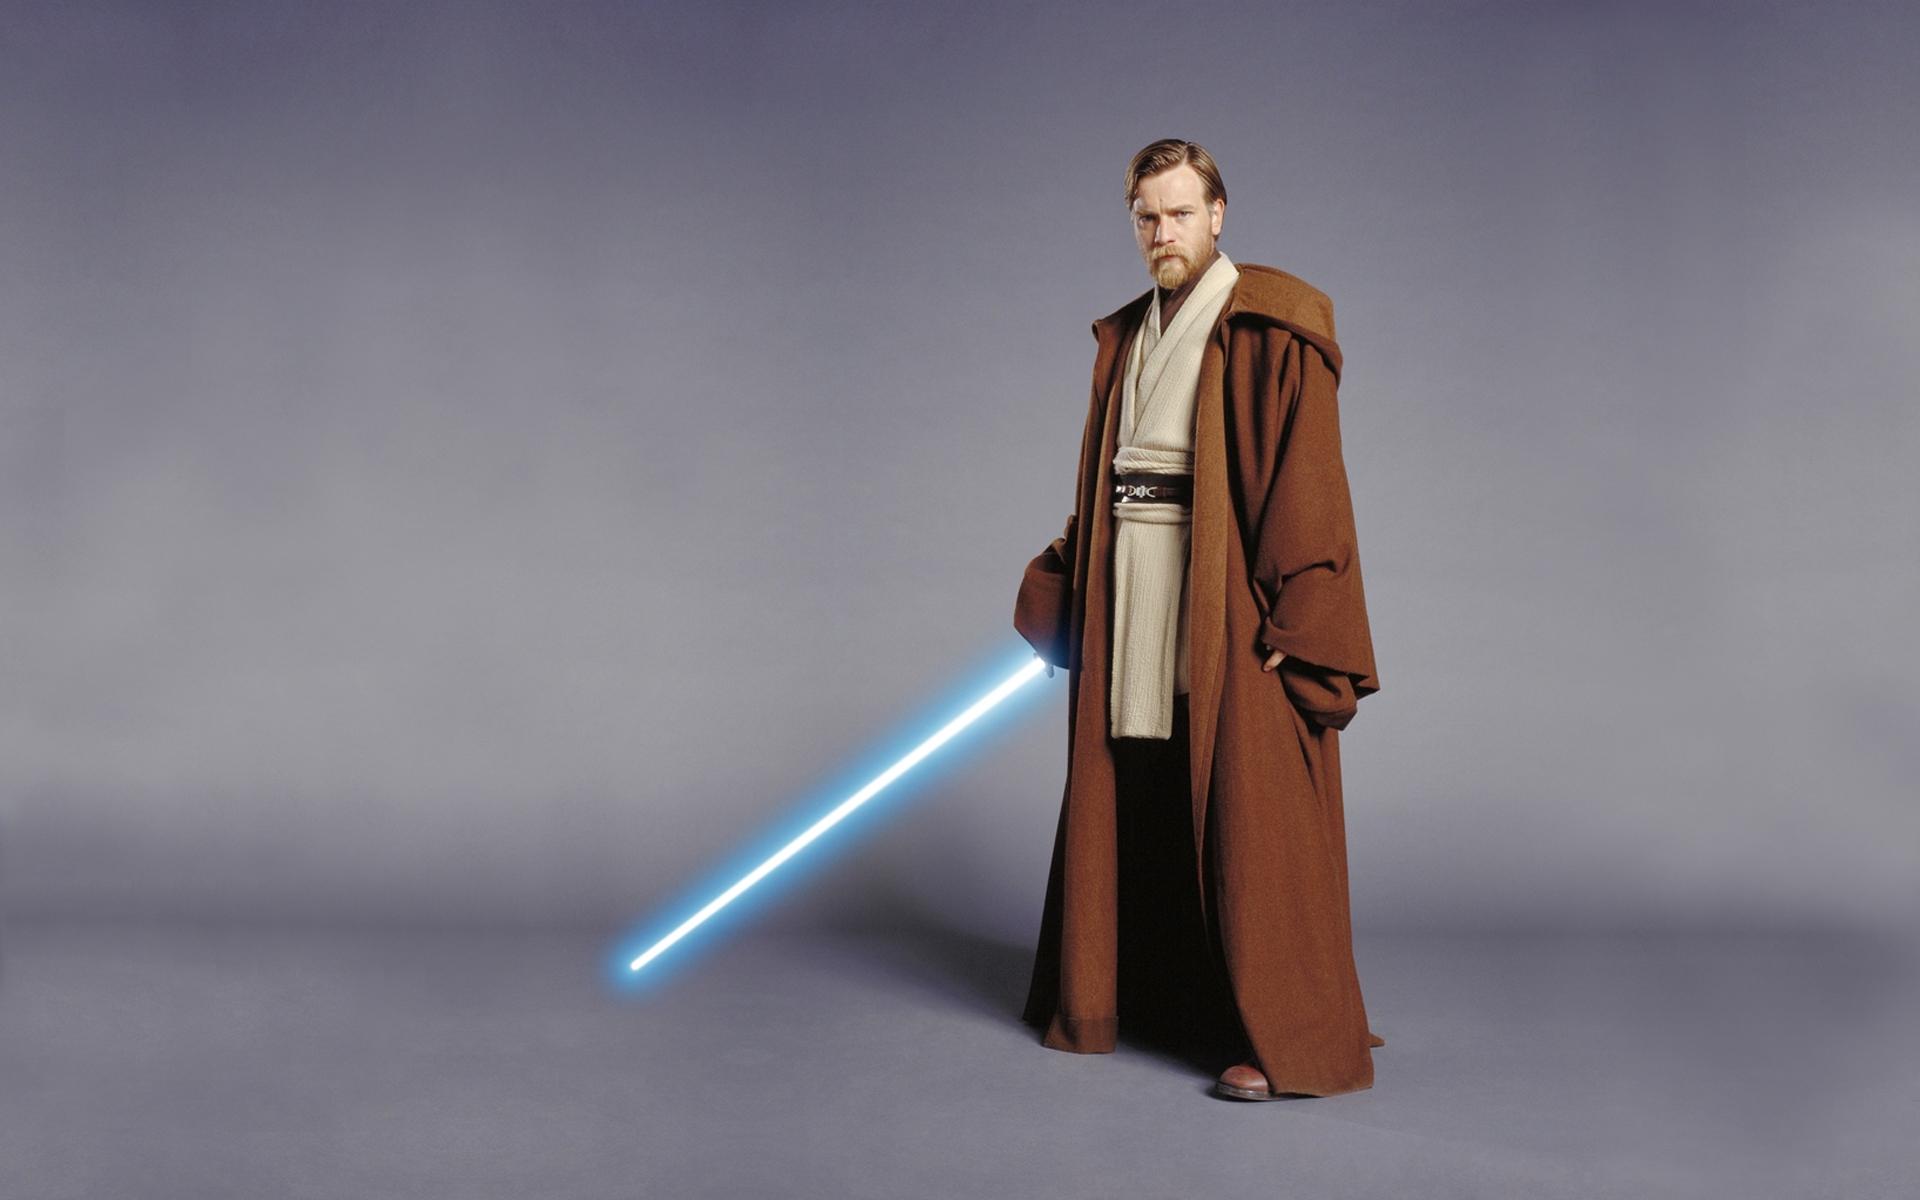 Obi Wan Kenobi Image 3